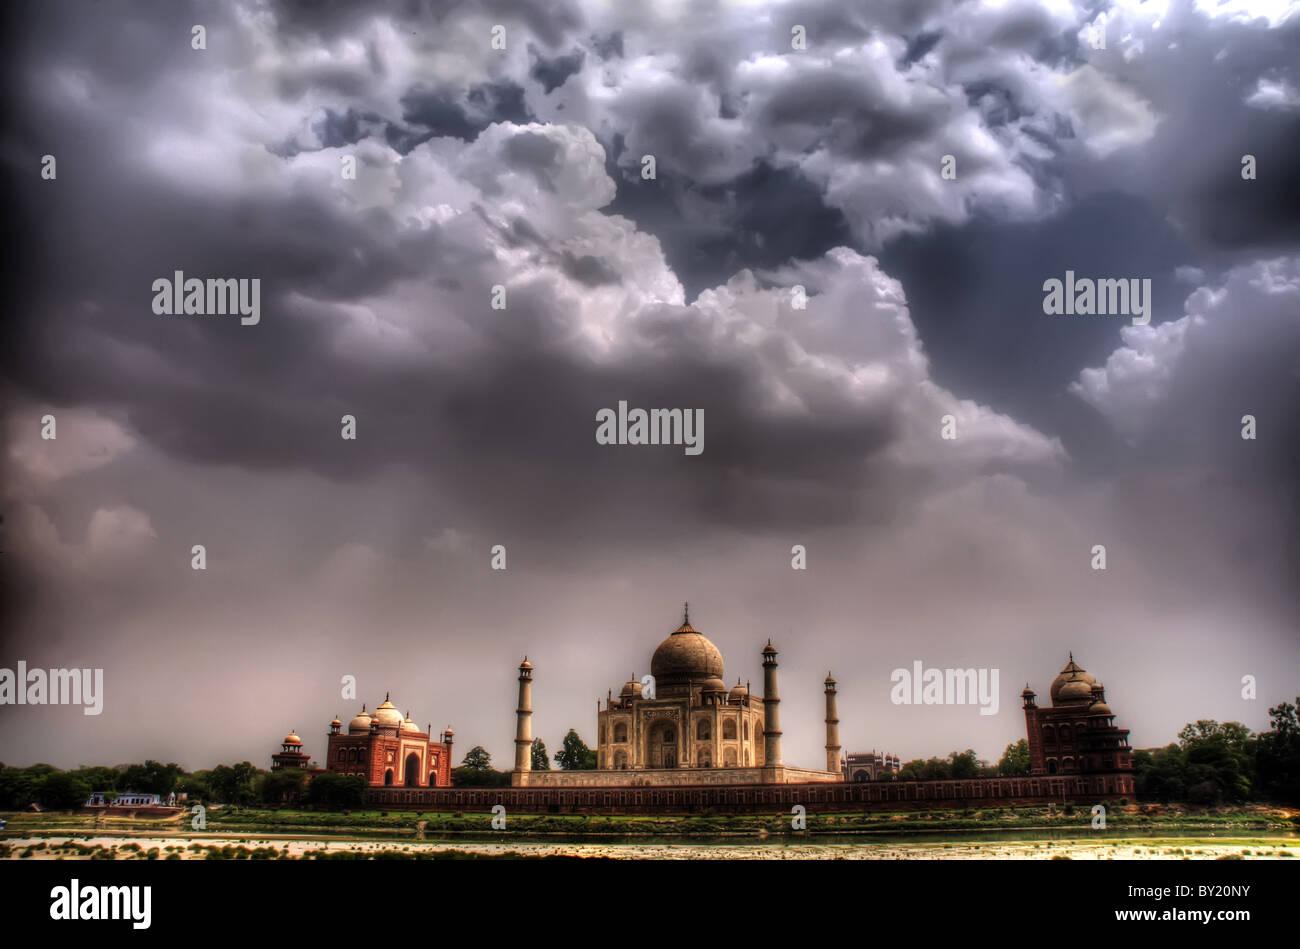 Einem aufziehenden Sturm über Taj Mahal Stockbild